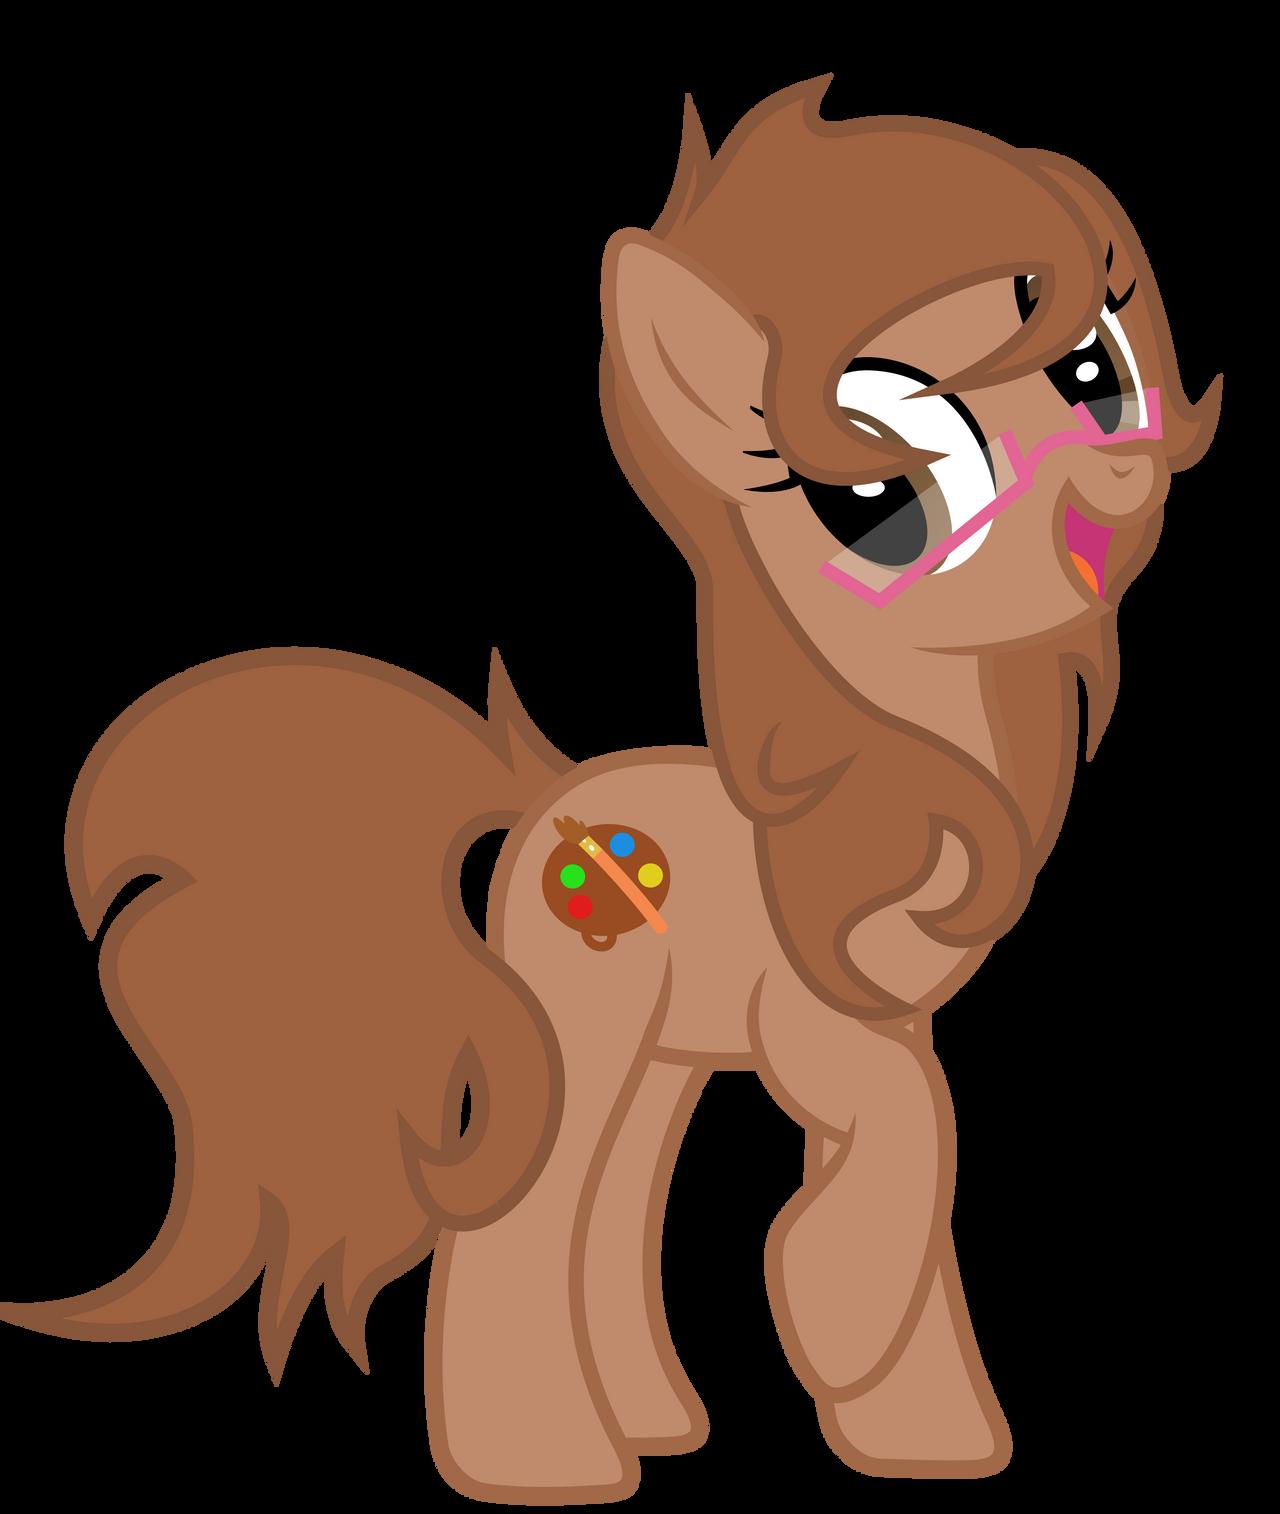 Request - Rainbow Paintbrush by DrFatalChunk